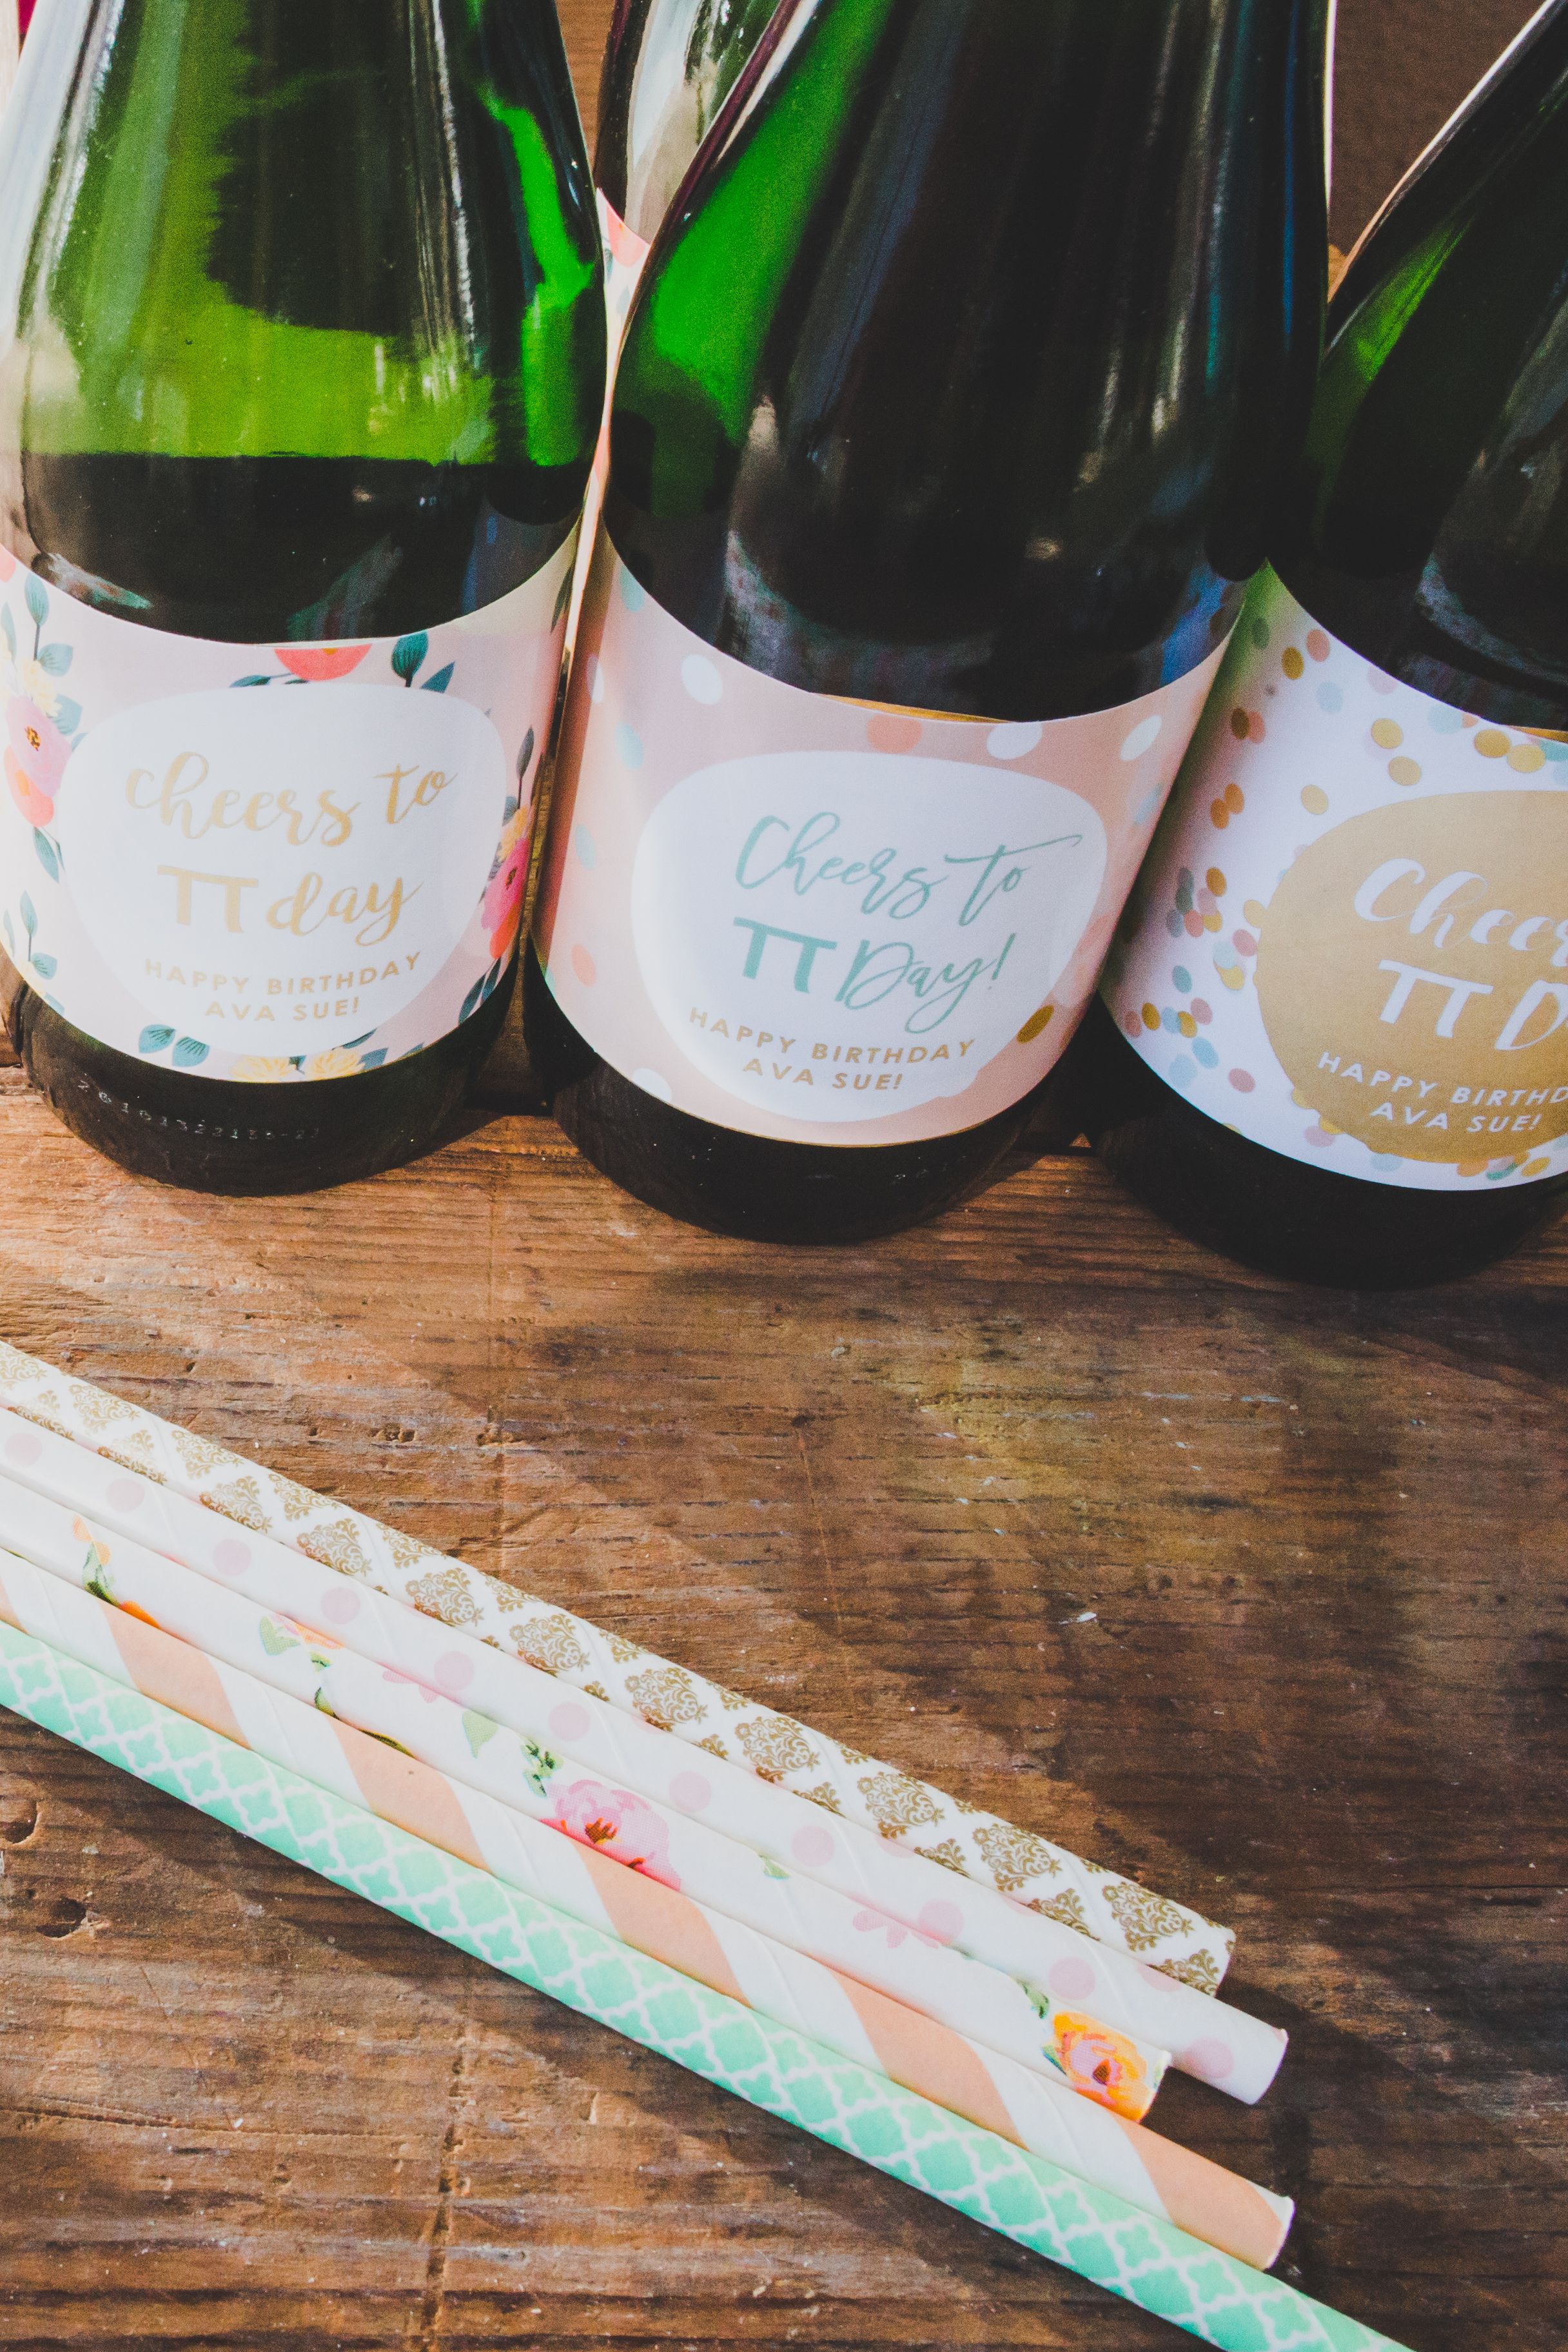 Vintage Paper Straws - First Birthday Party Ideas - A Vintage Chic Pi Day Themed 1st Birthday Party   Ava's First Birthday